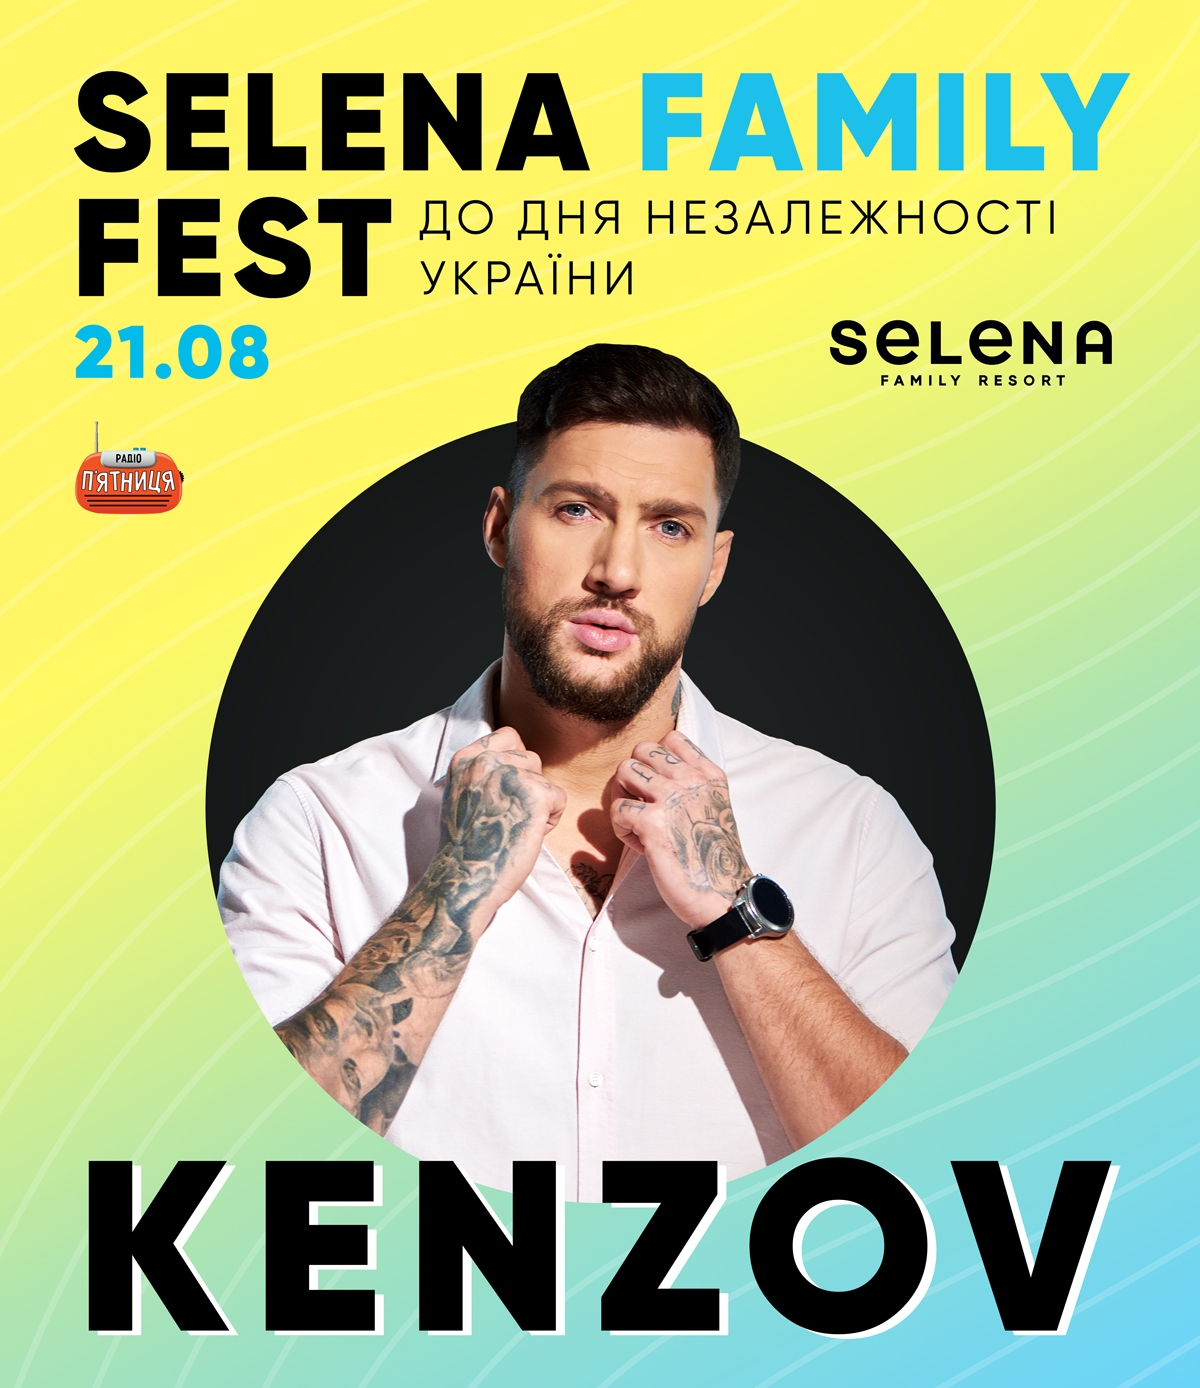 SelenaFamilyFest_Кензов_Черкассы_A2